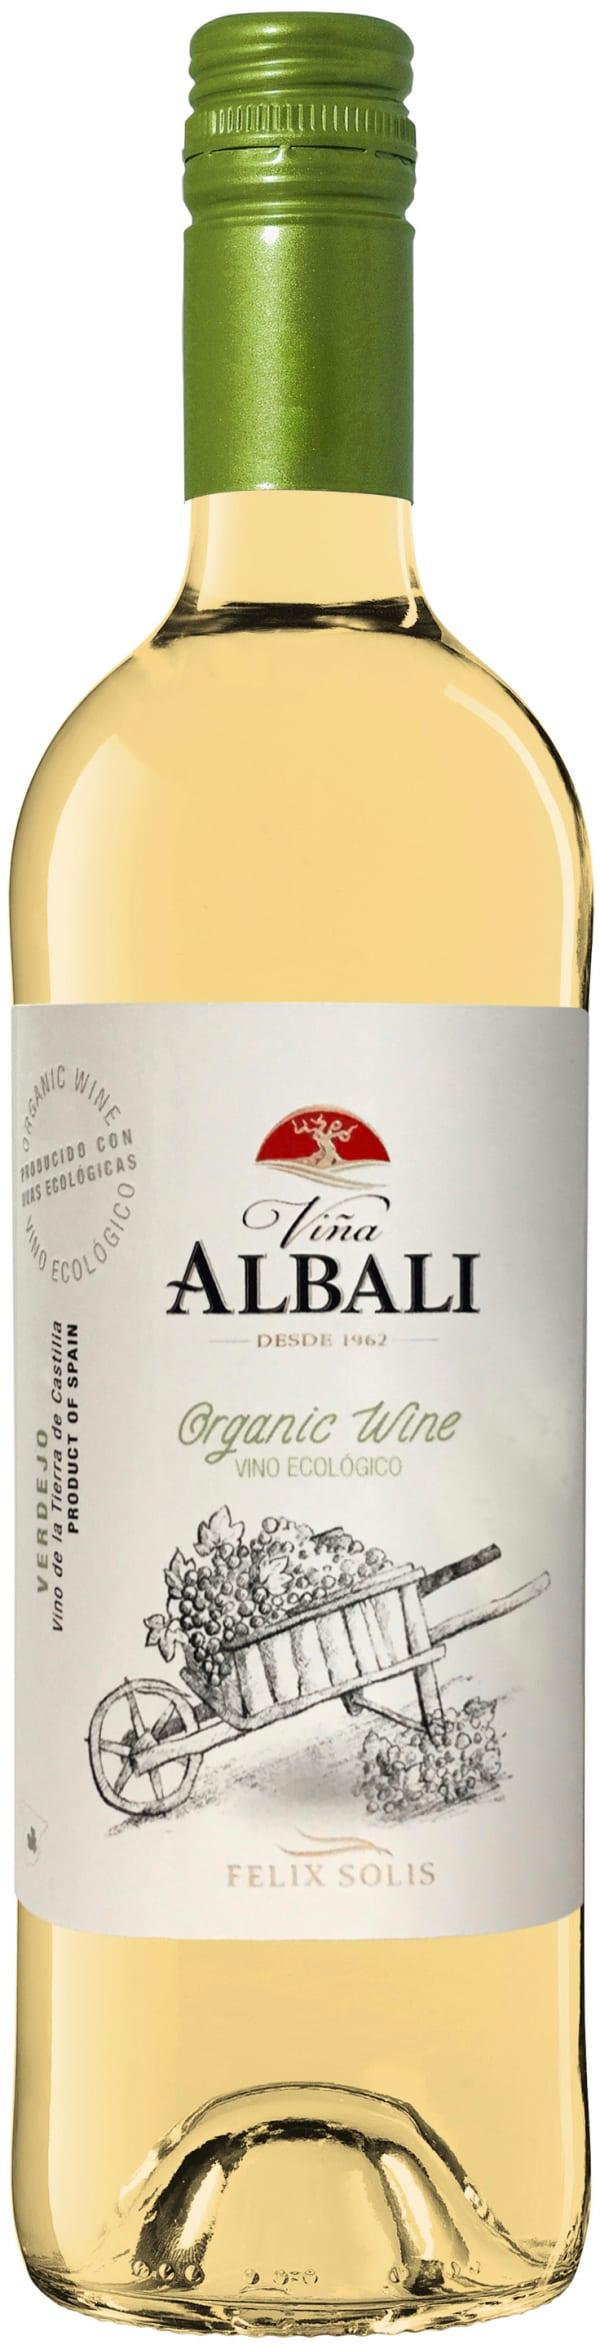 Viña Albali Verdejo Organic 2018